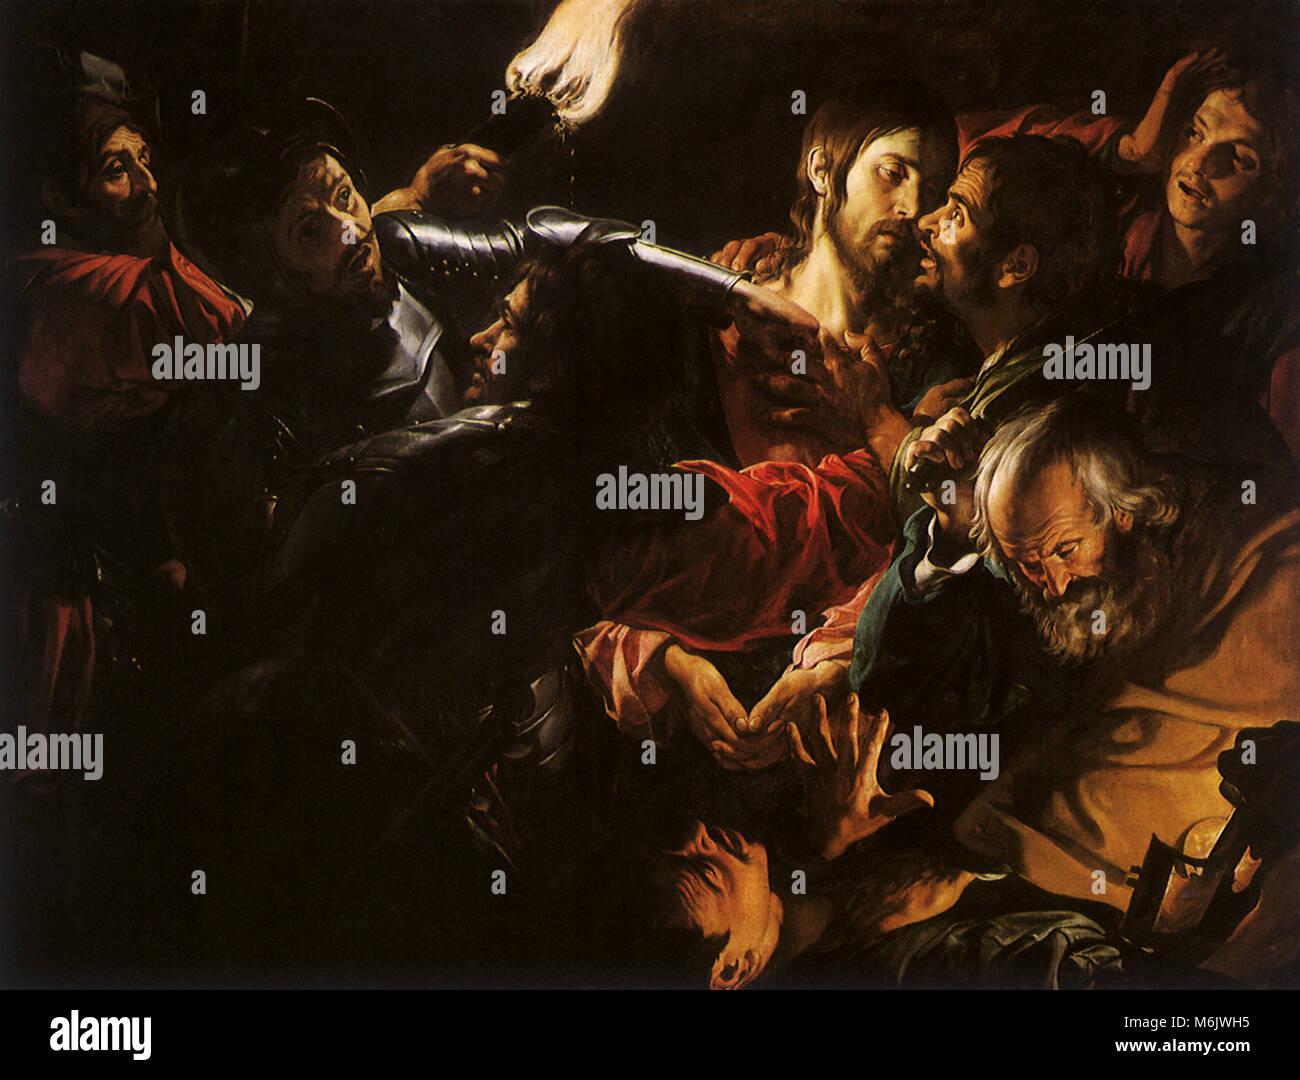 The Taking of Christ, Boulogne, Valentin de, 1630. - Stock Image